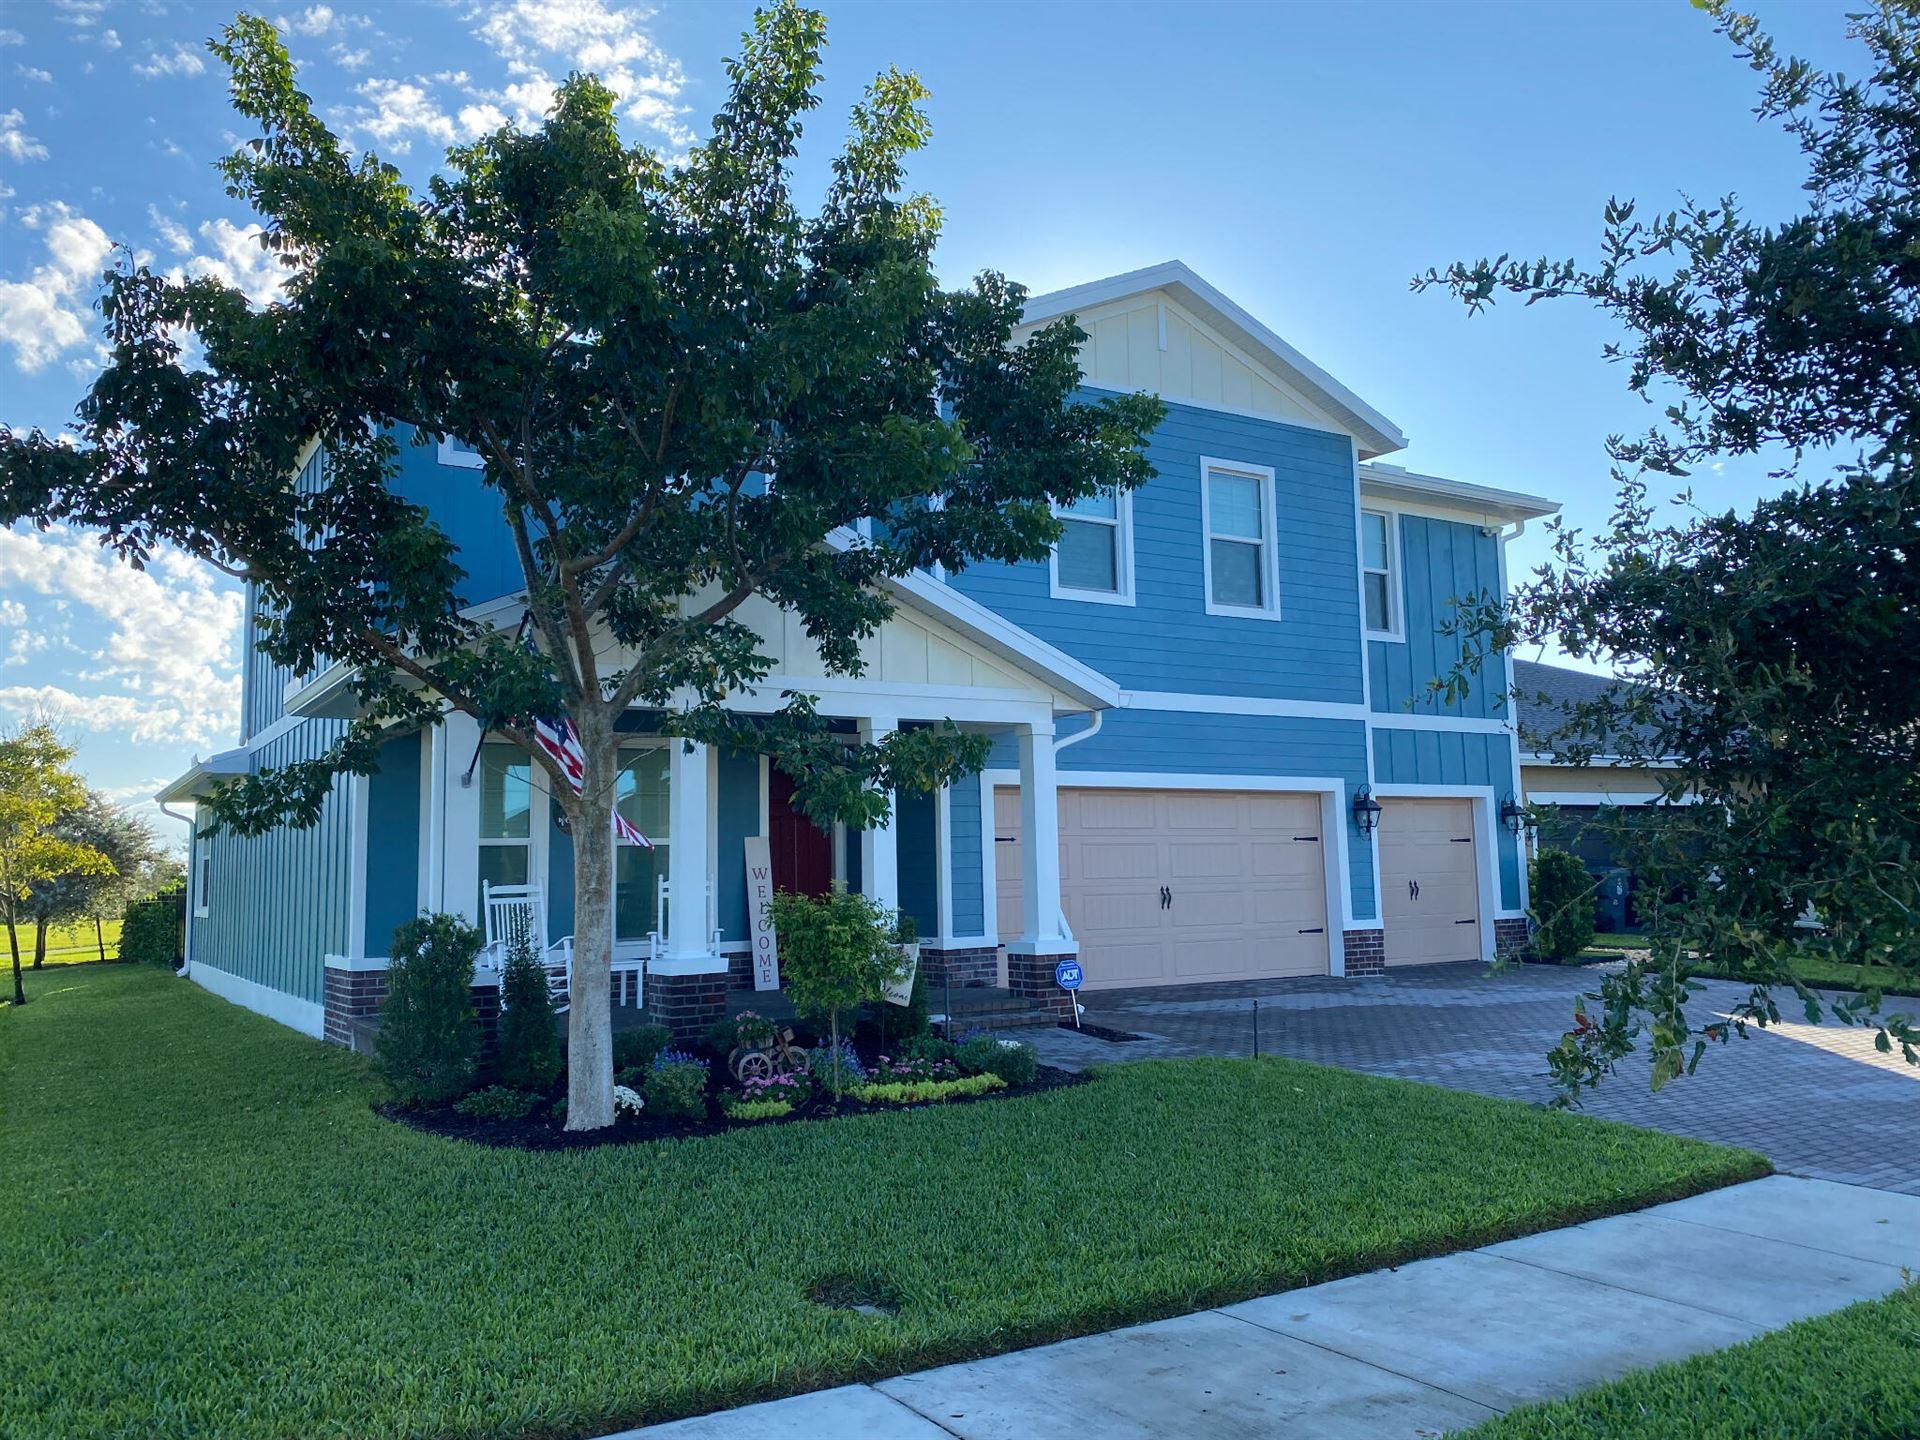 Photo of 890 Sweetgrass Street, Loxahatchee, FL 33470 (MLS # RX-10752586)